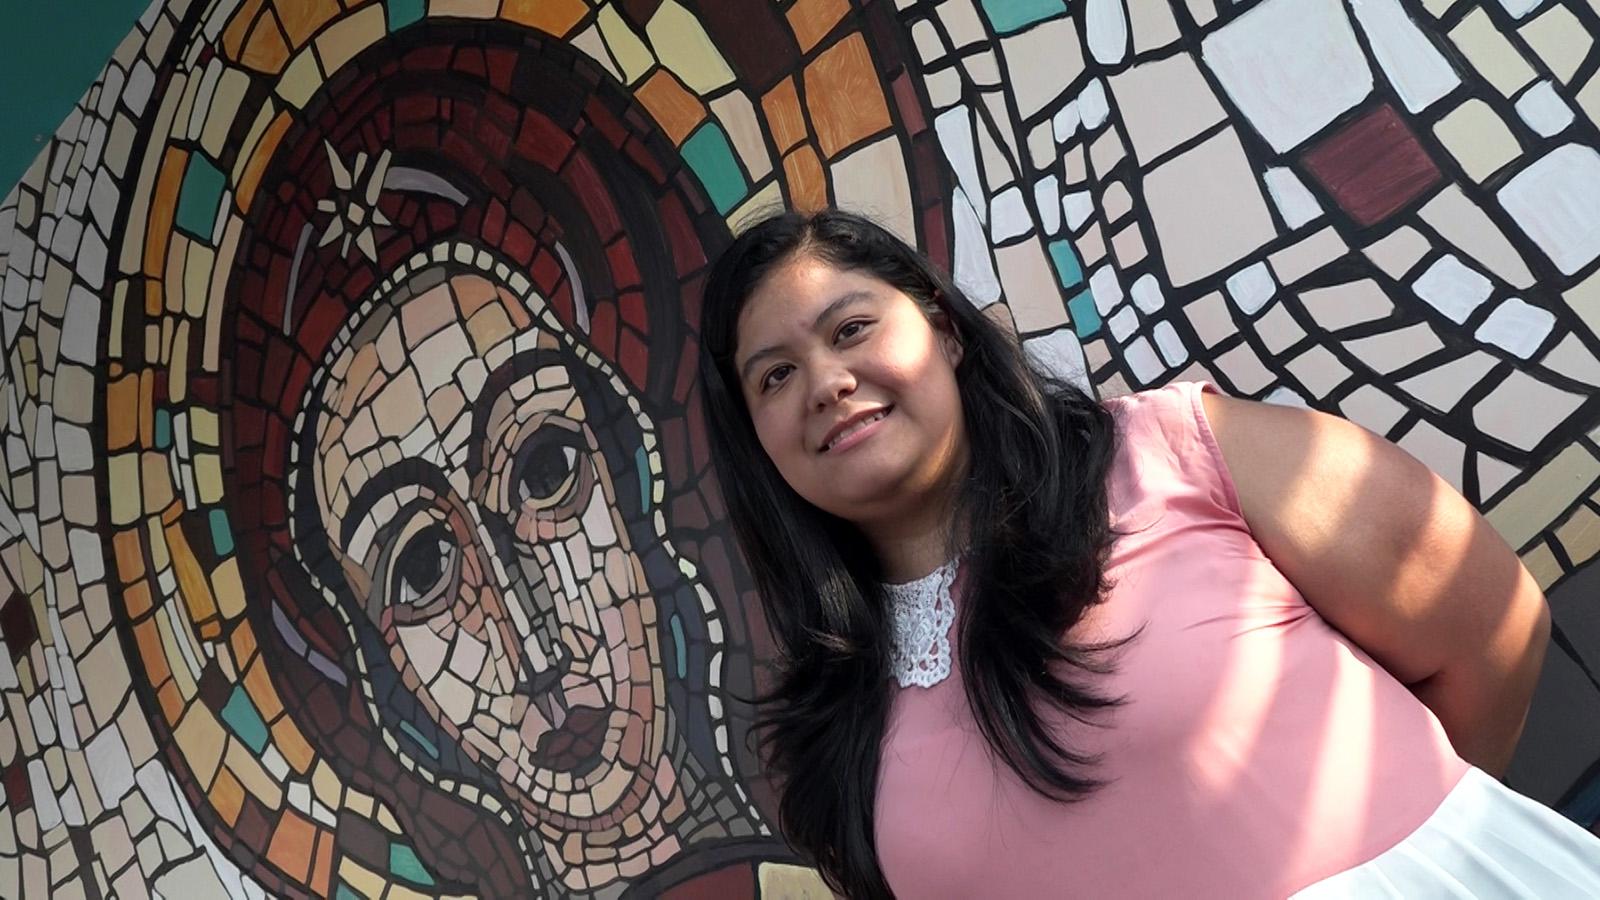 Estudiante mexicana cursa estudios en la UCSS